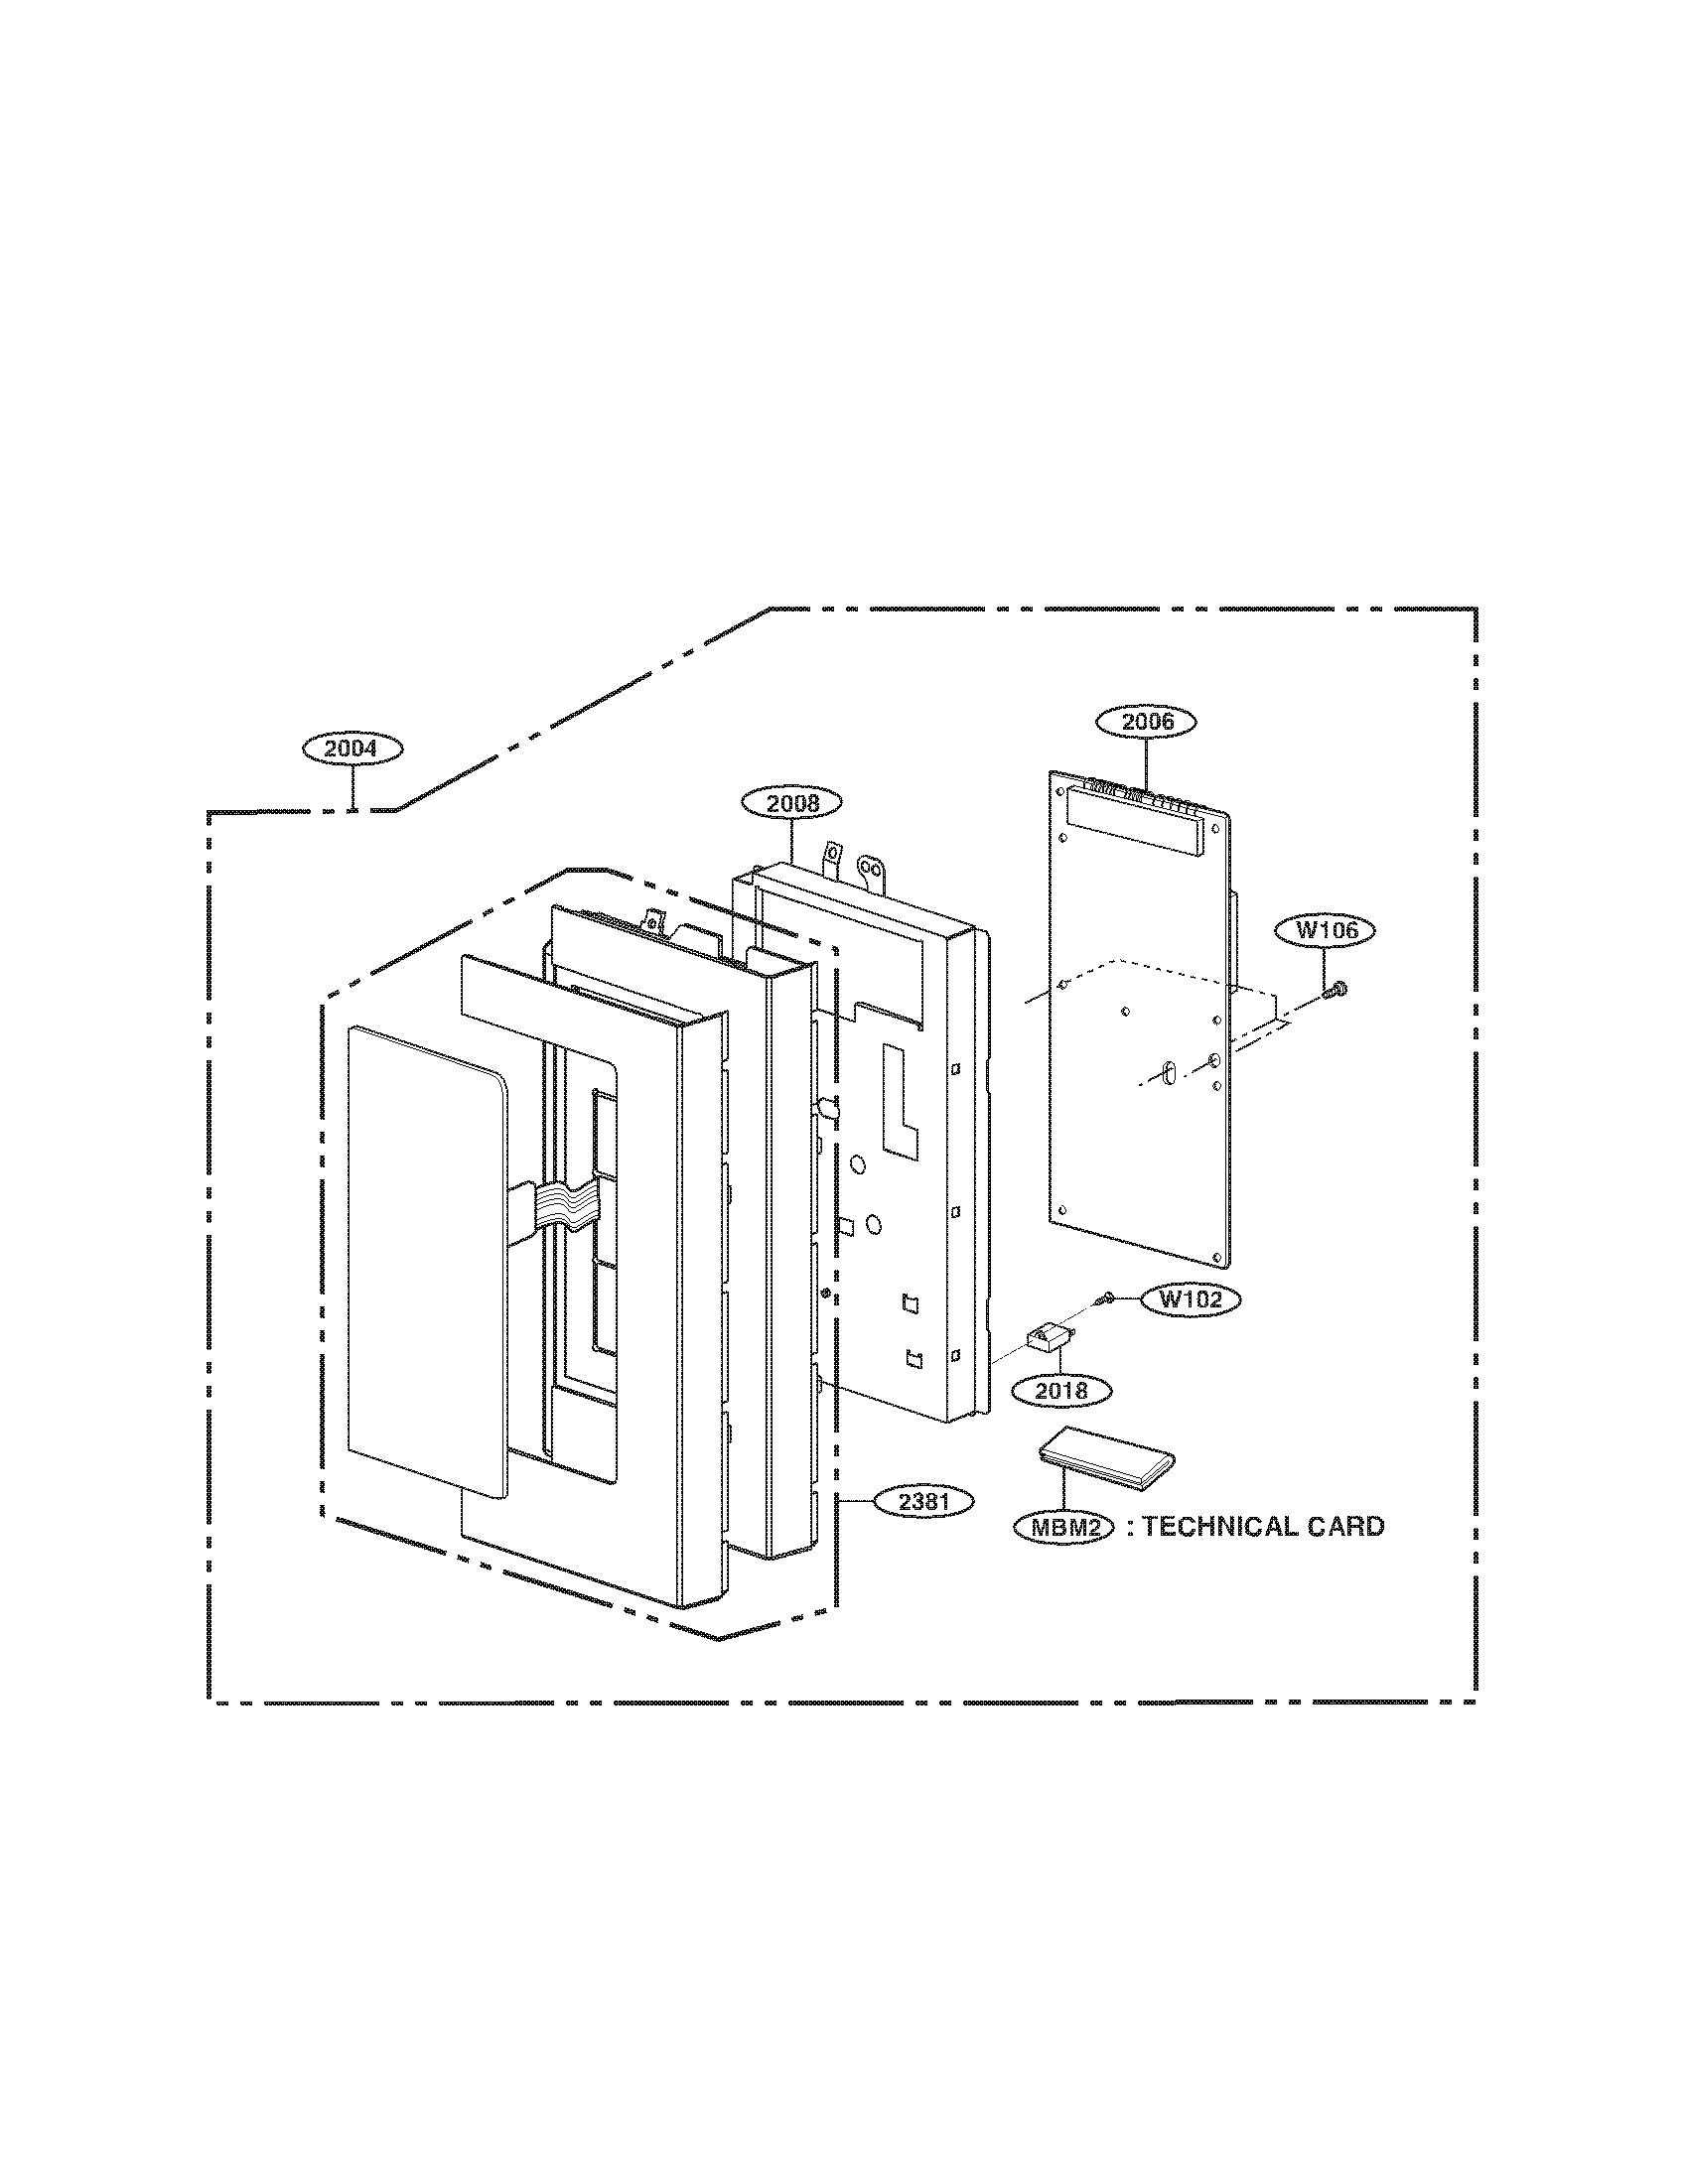 Lg Microwave Lmv1680st